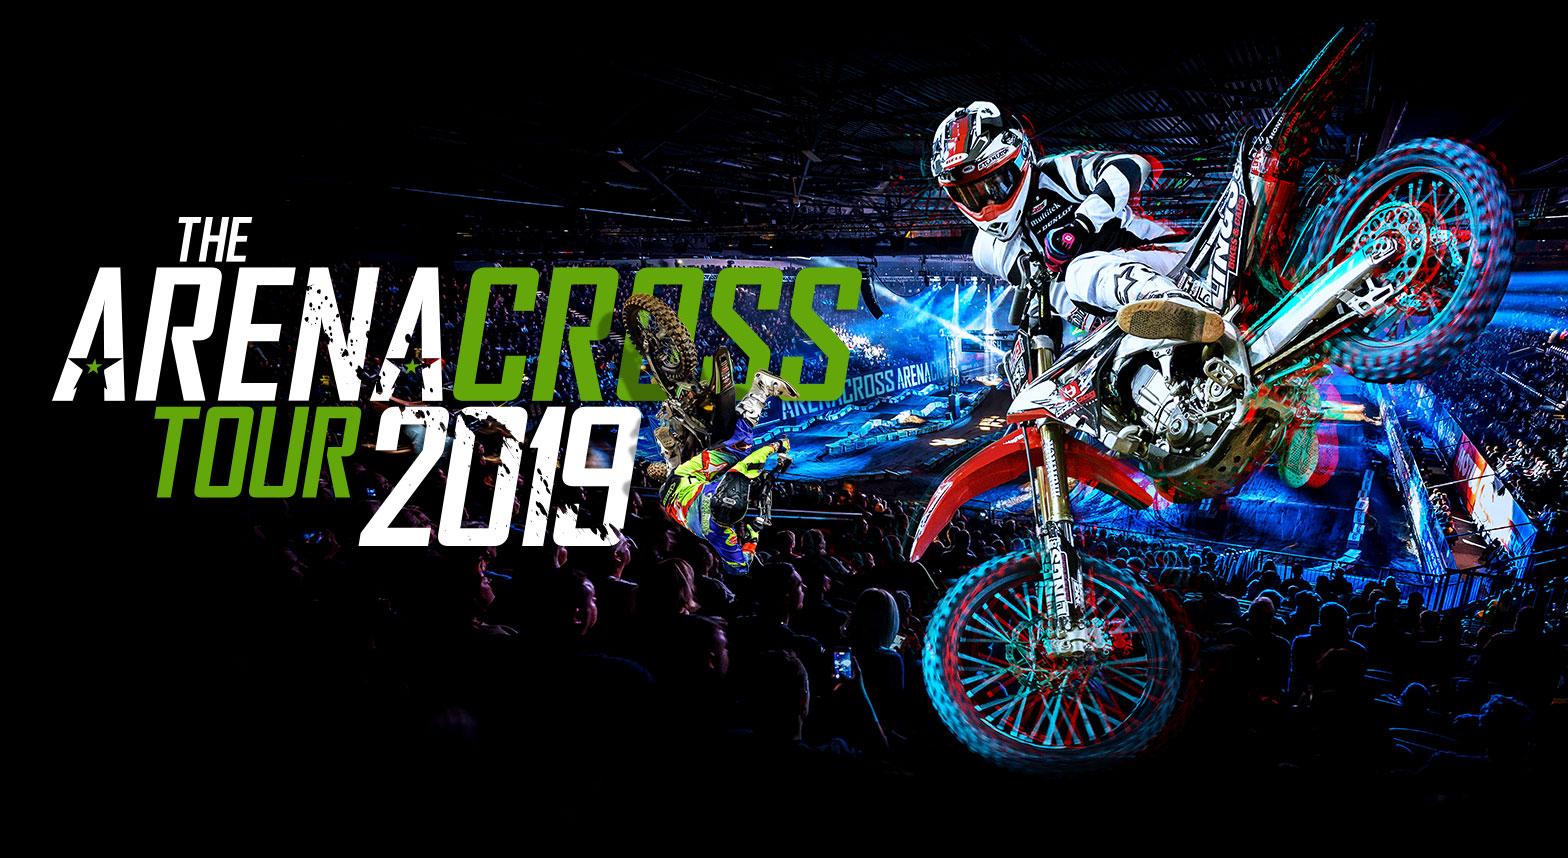 Arenacross_Birmingham_1568x858px.jpg